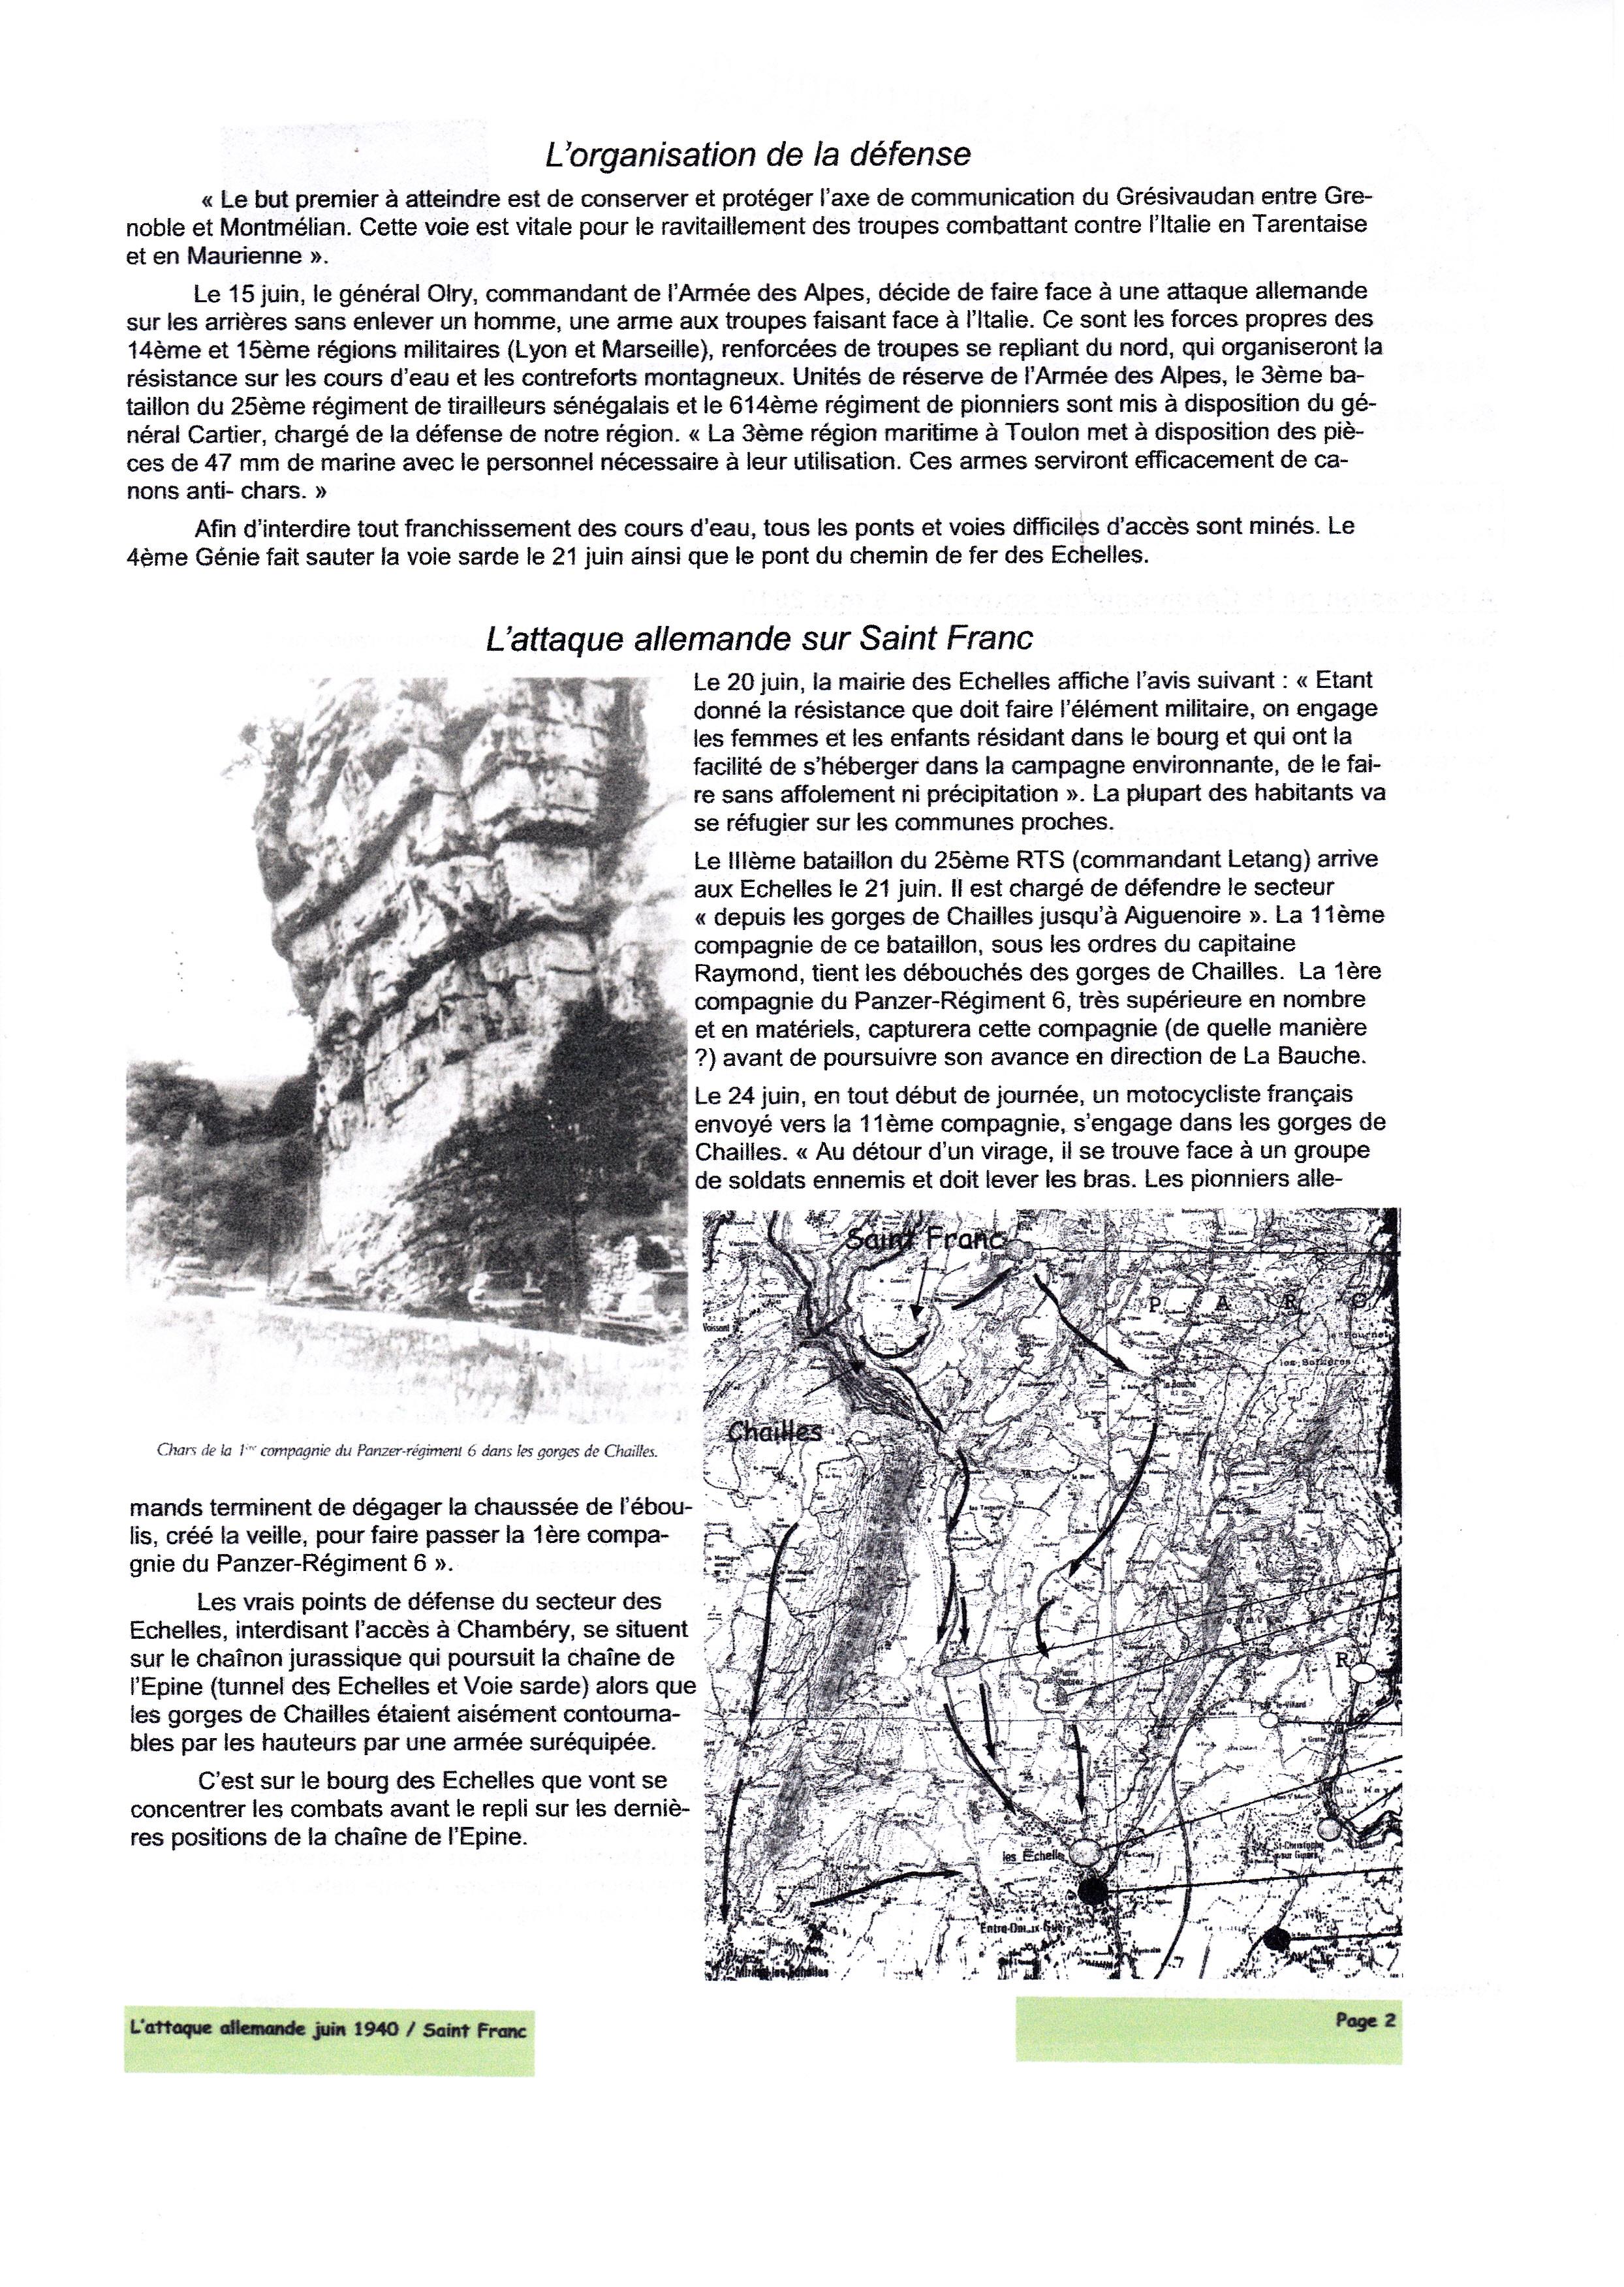 JUIN 1940 Page 2